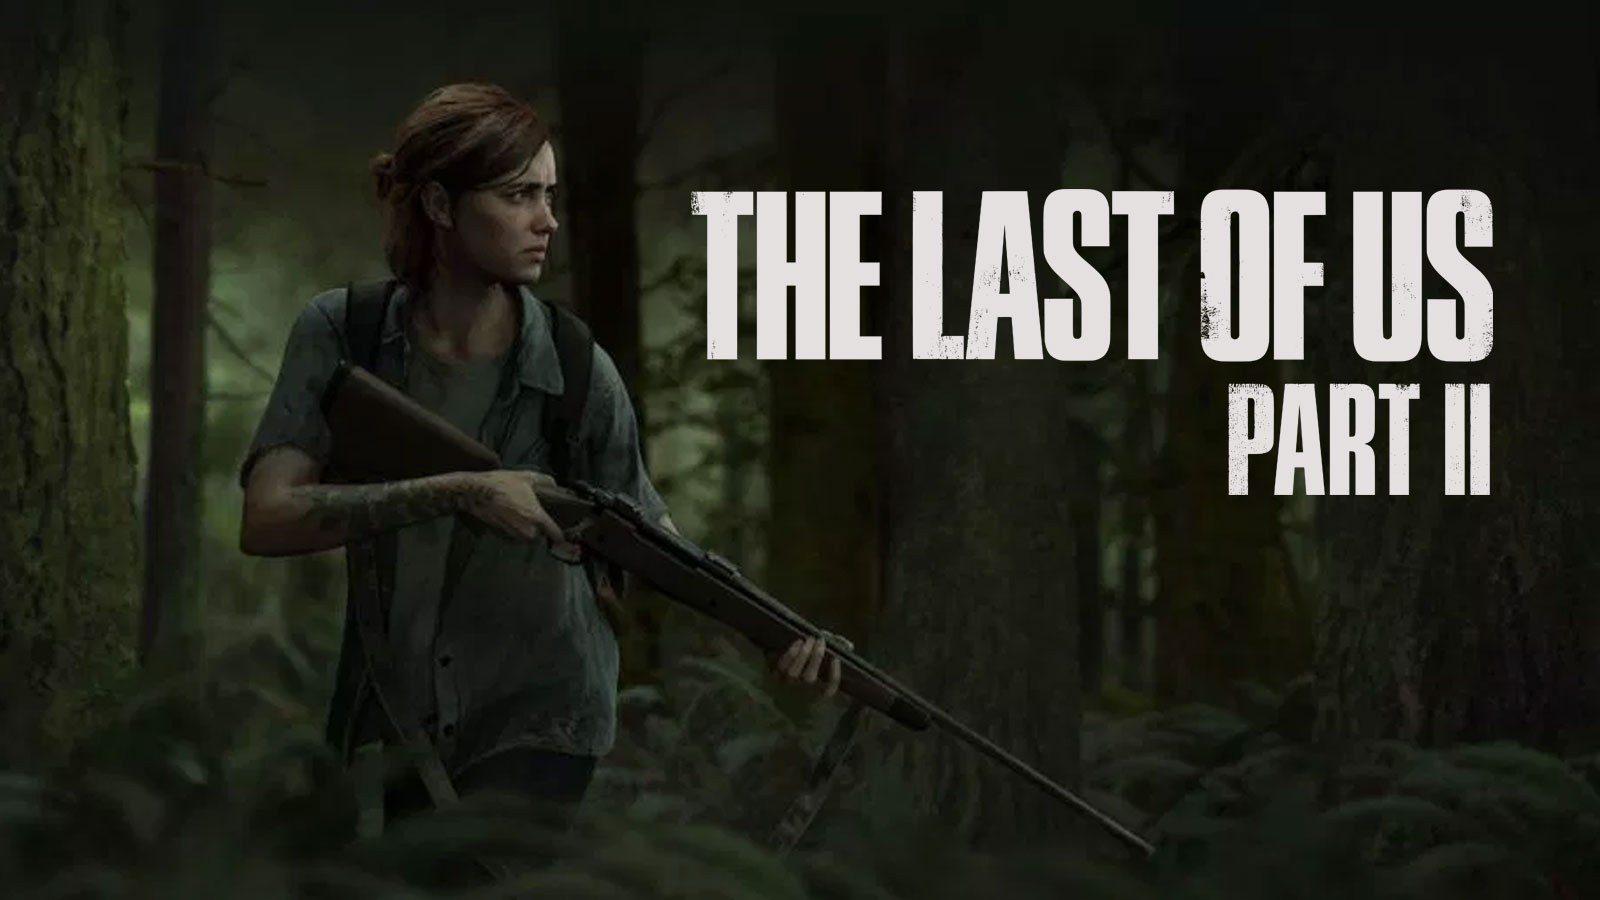 The Last of Us Part 2 موازاتی با قسمت اول خواهد داشت